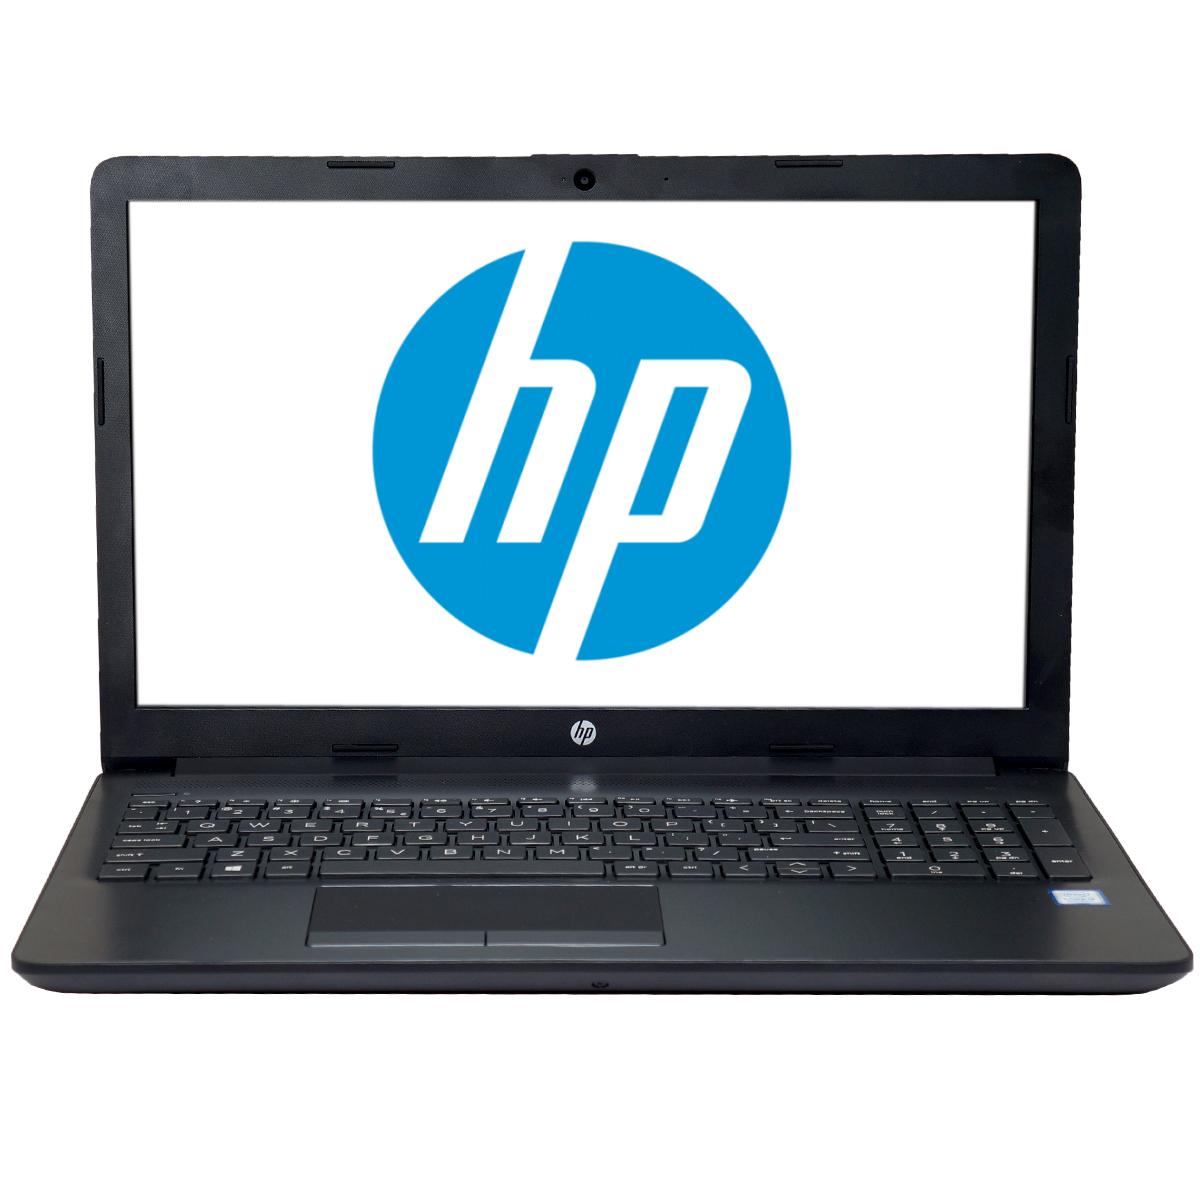 لپ تاپ 15 اینچی اچ پی مدل 15-da0072nia - A